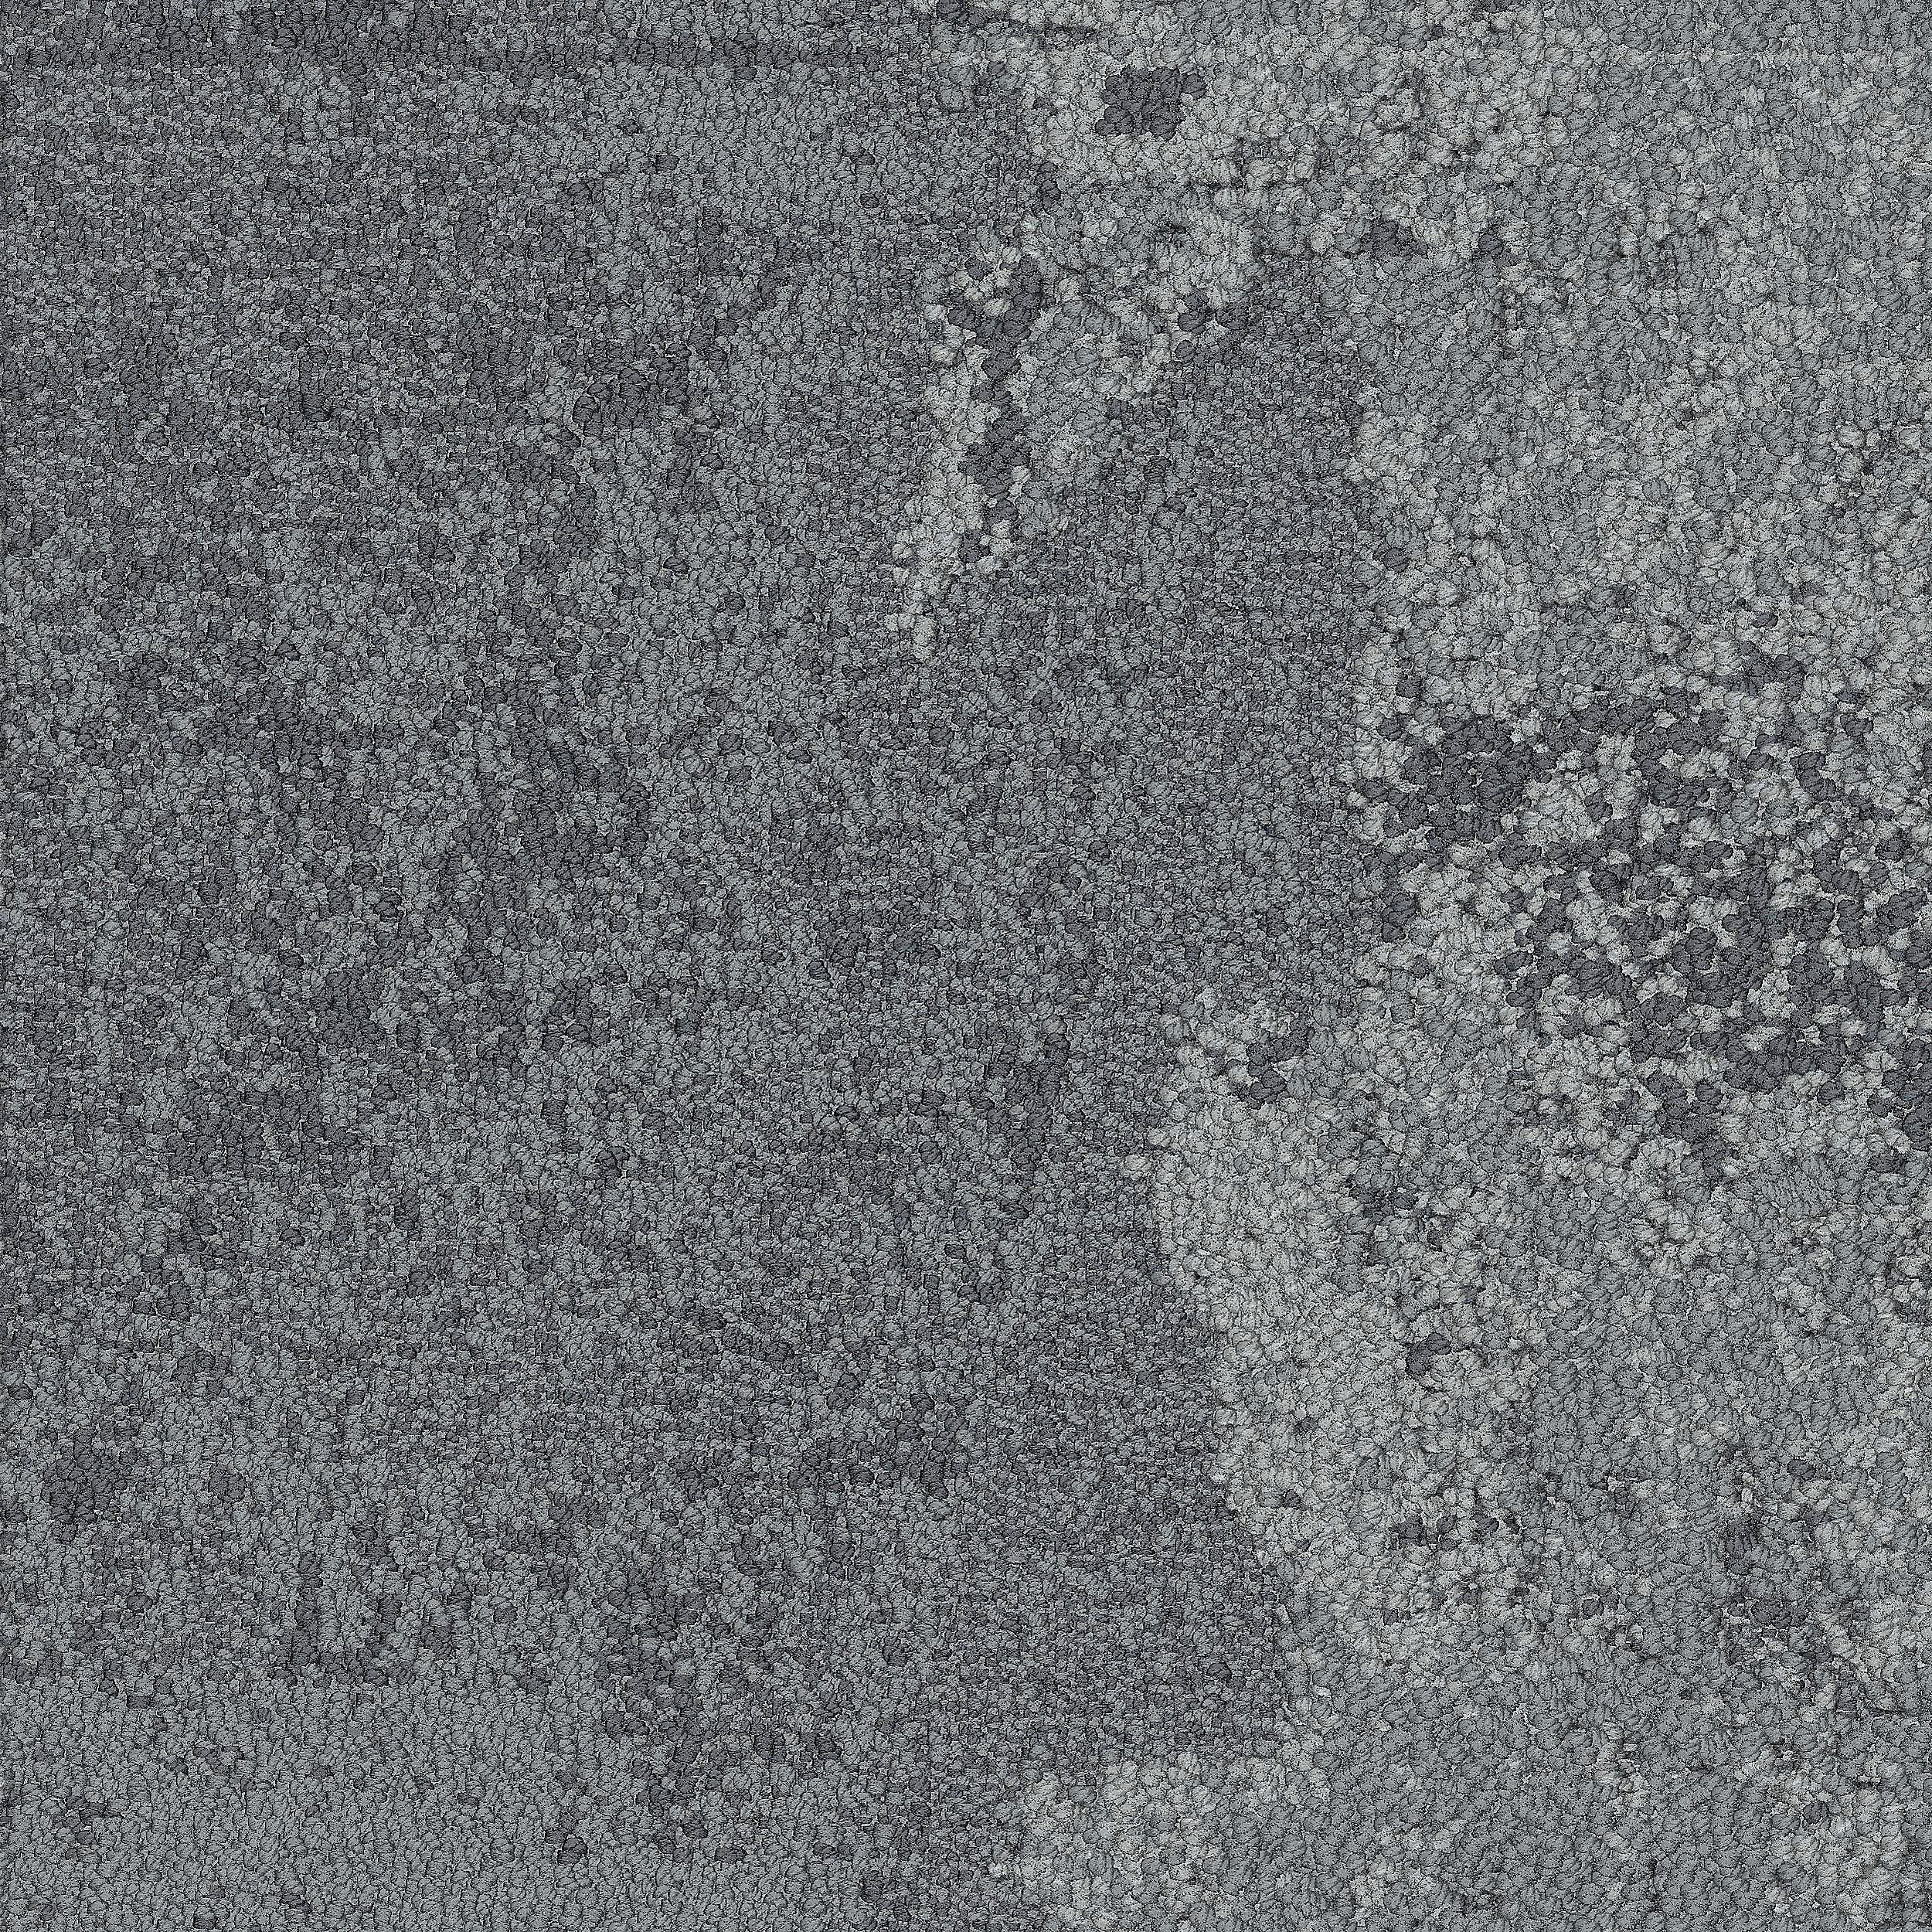 Interface Net Effect B602 North Sea 332913 Net Effect